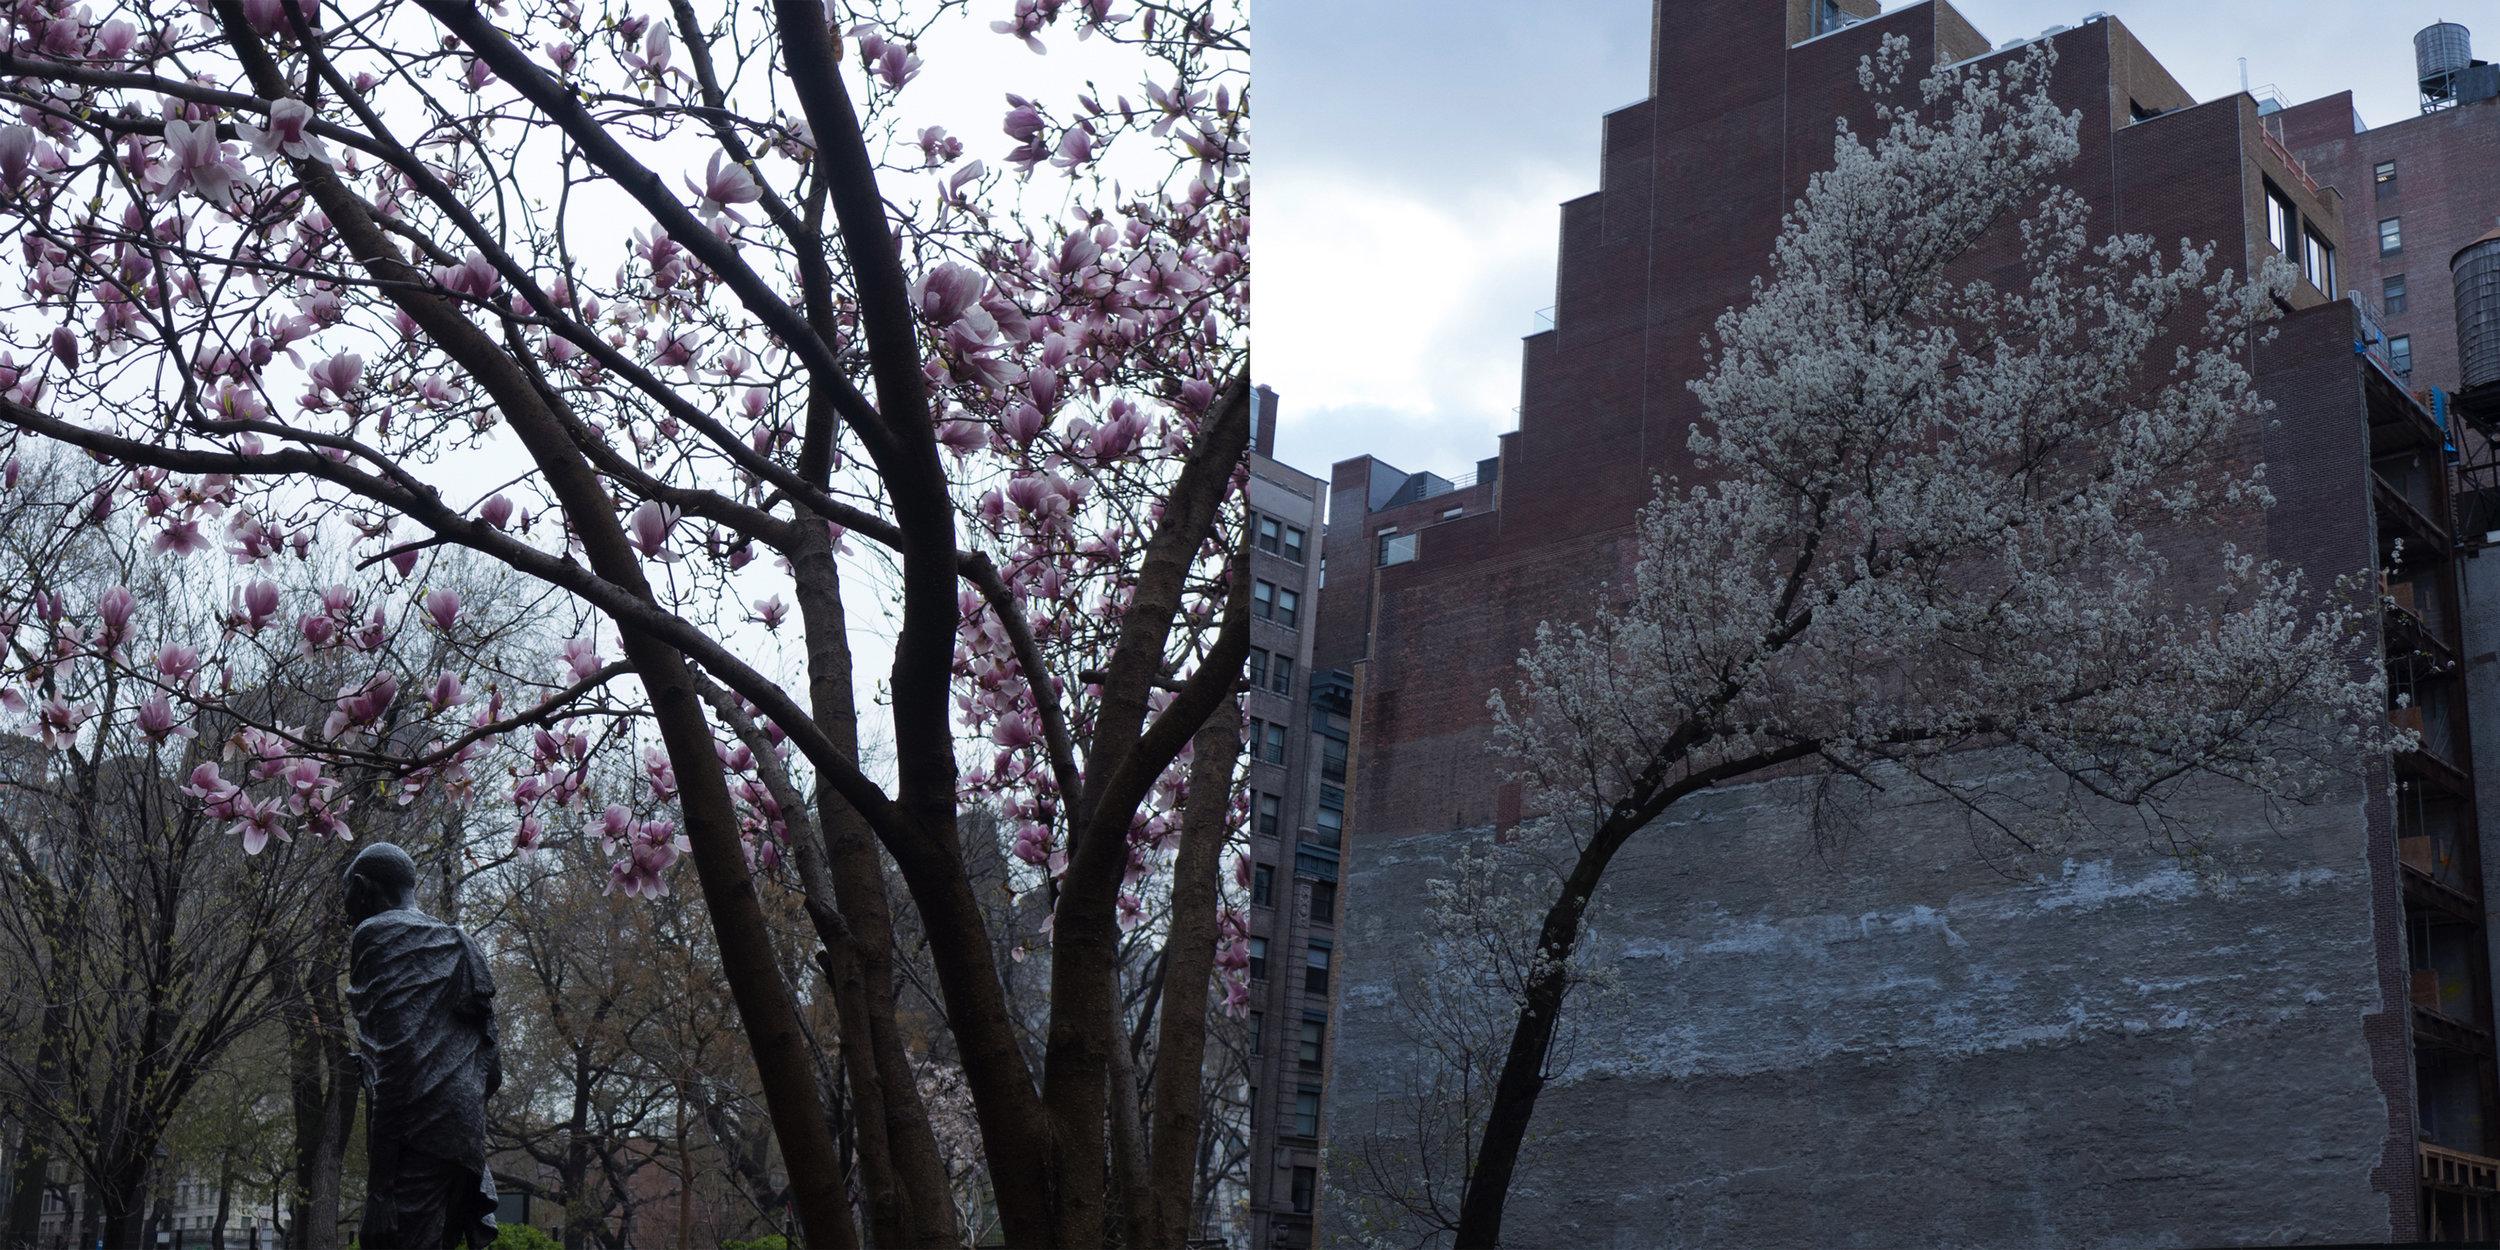 Gandhi, Union Square & Cherry Tree, University Place